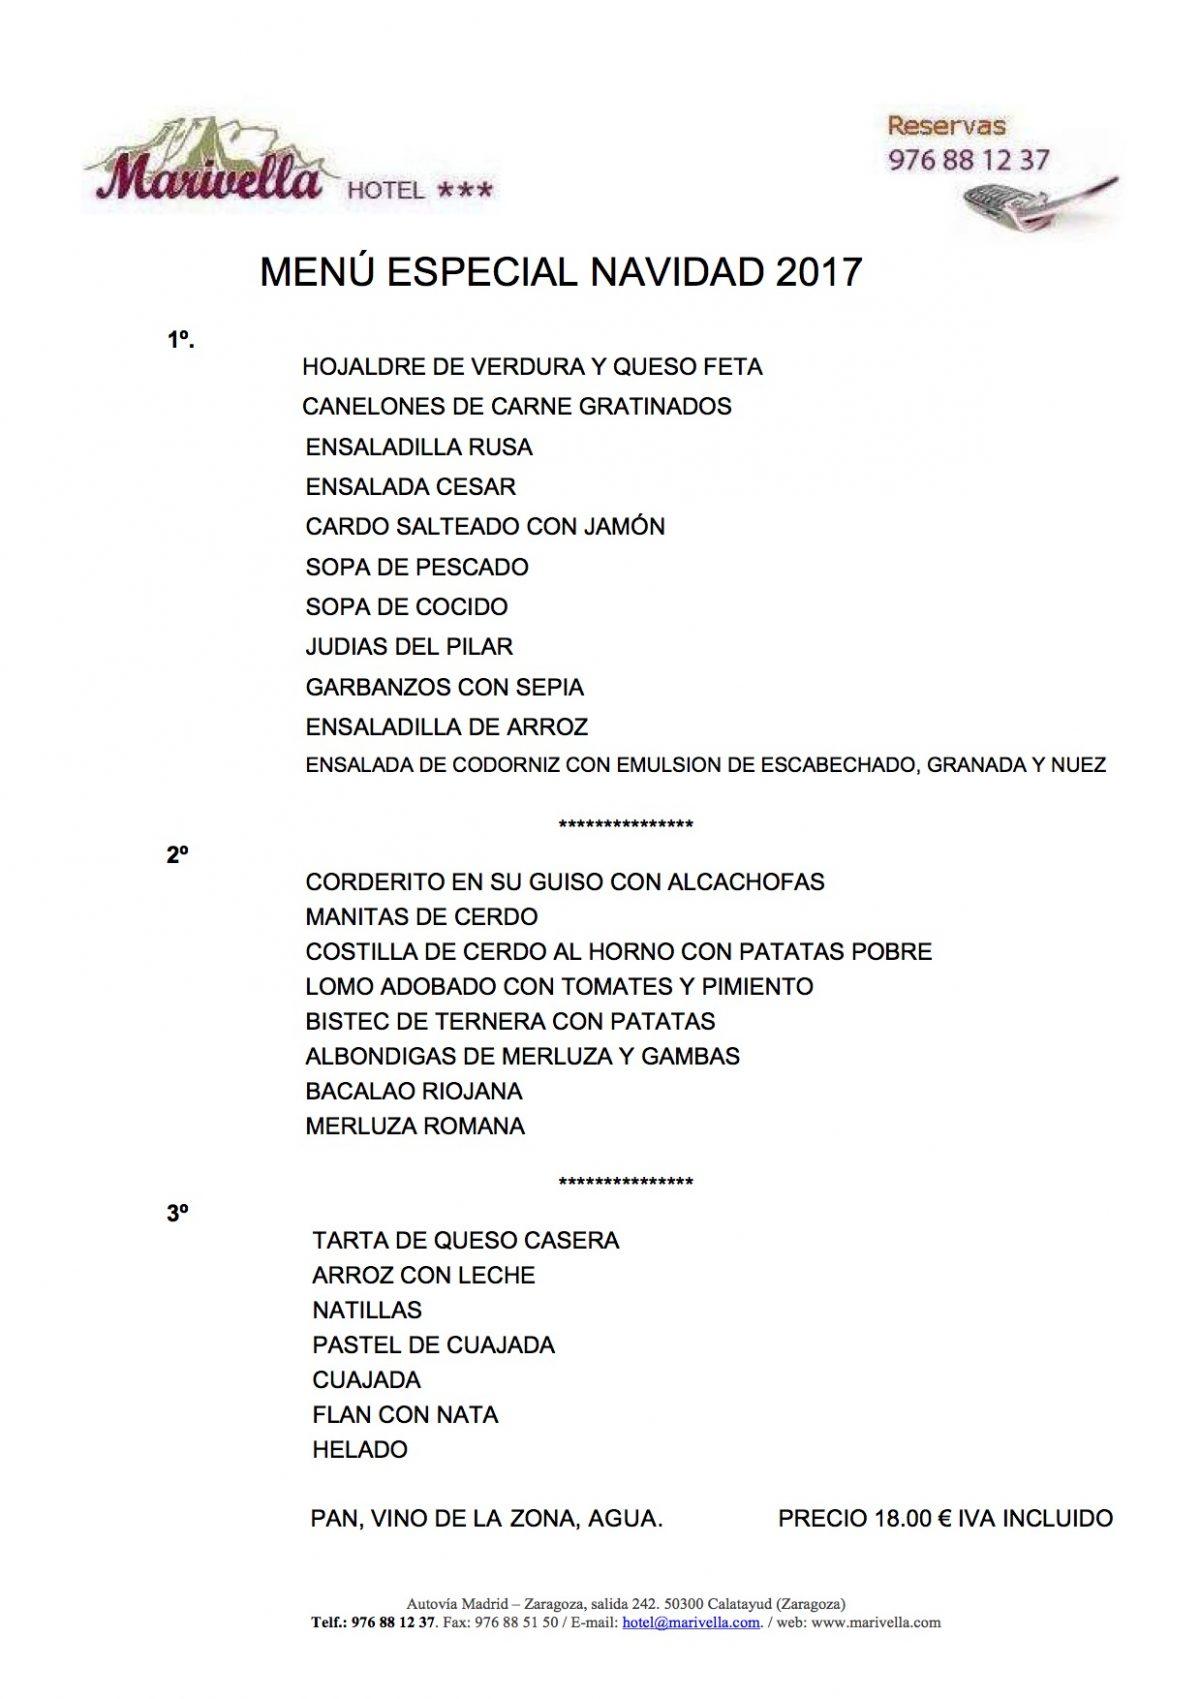 MENU-ESPECIAL-NAVIDAD-2017-1200x1699.jpg